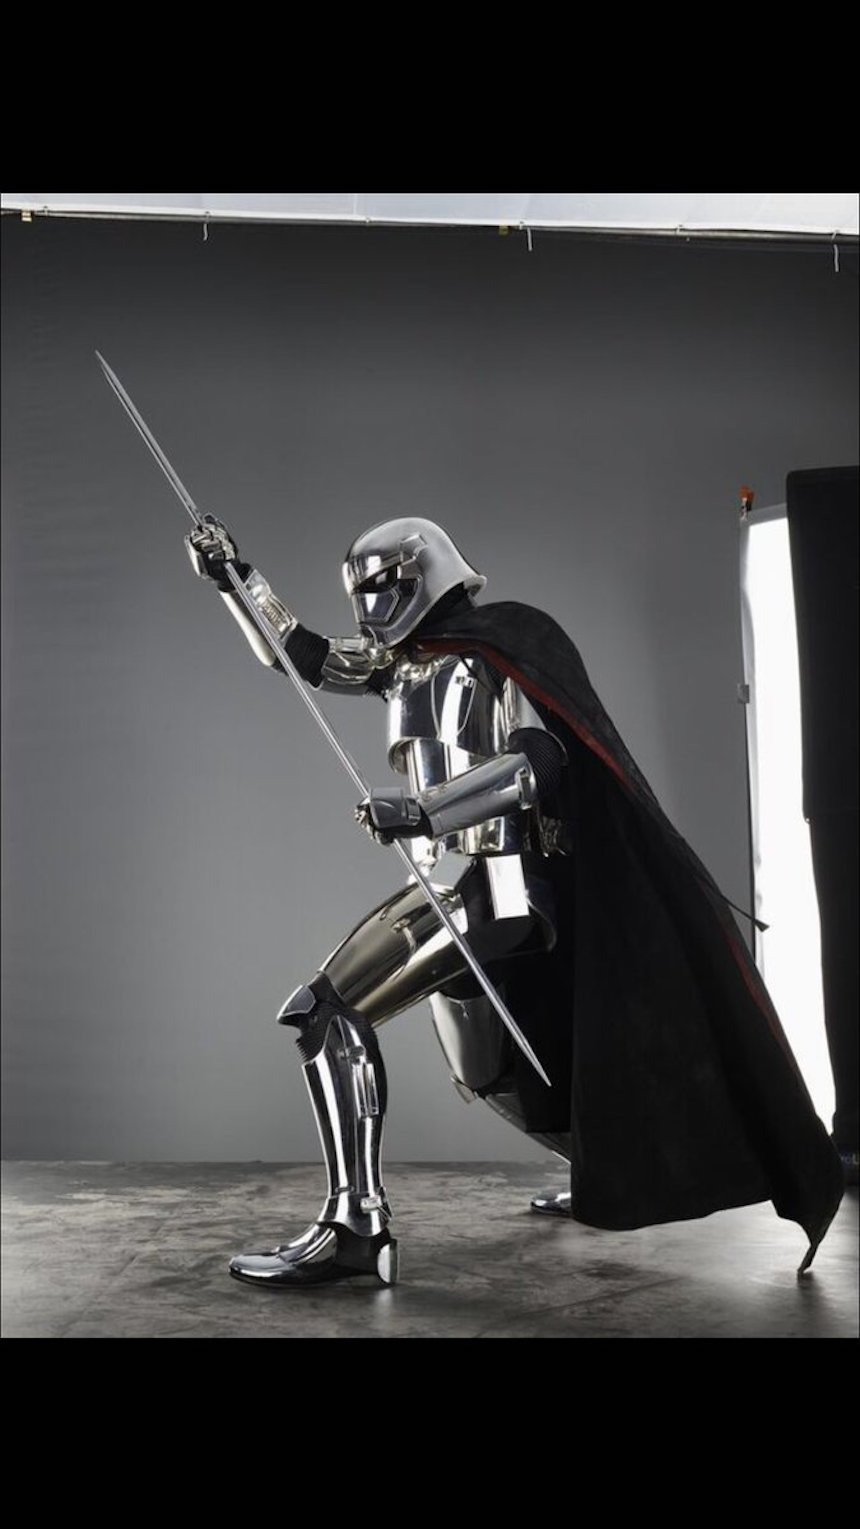 Star Wars: The Last Jedi - Phasma